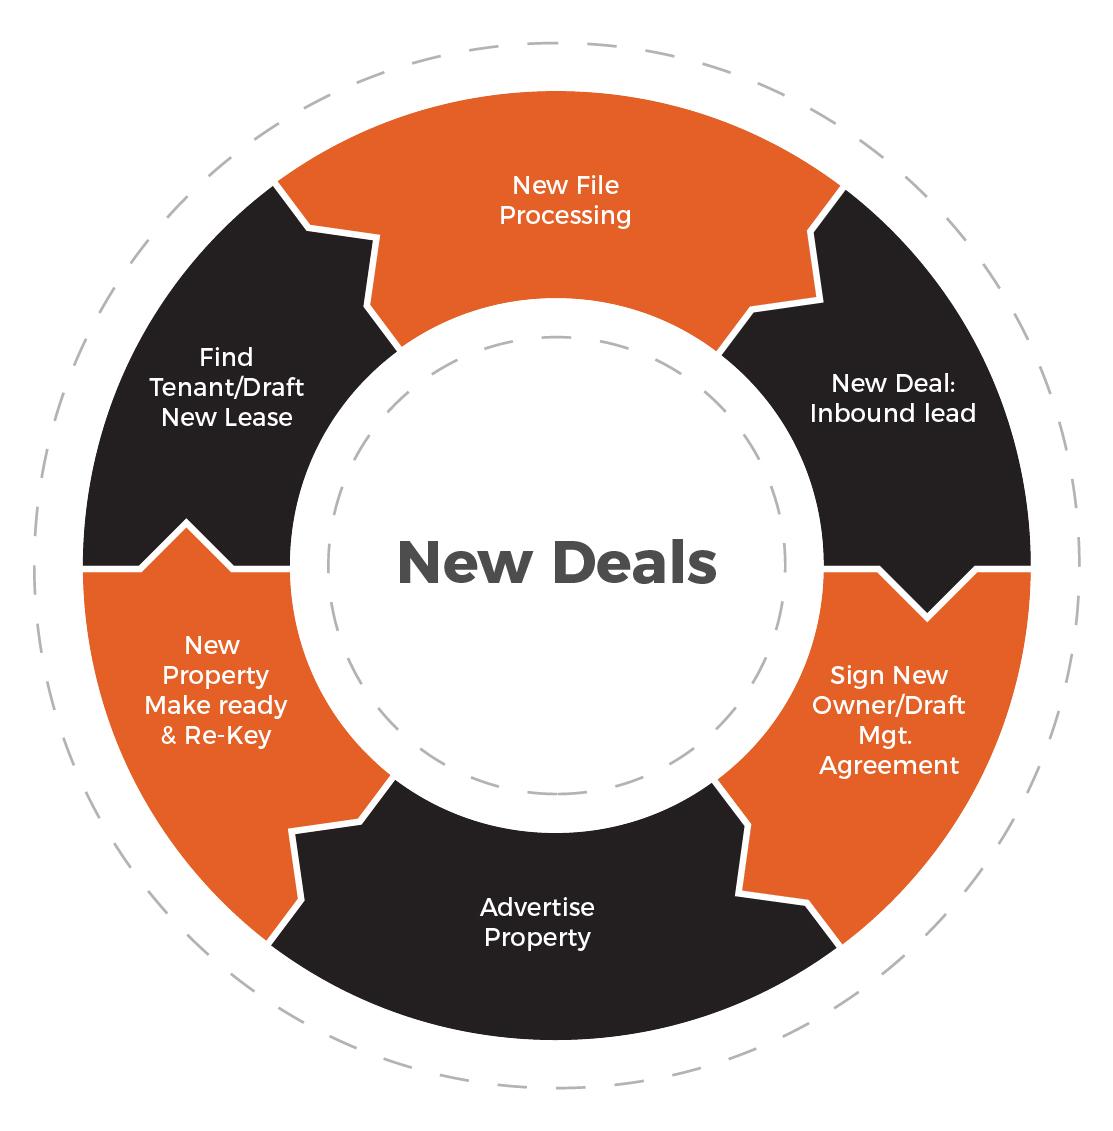 New Deals by Rent Bridge